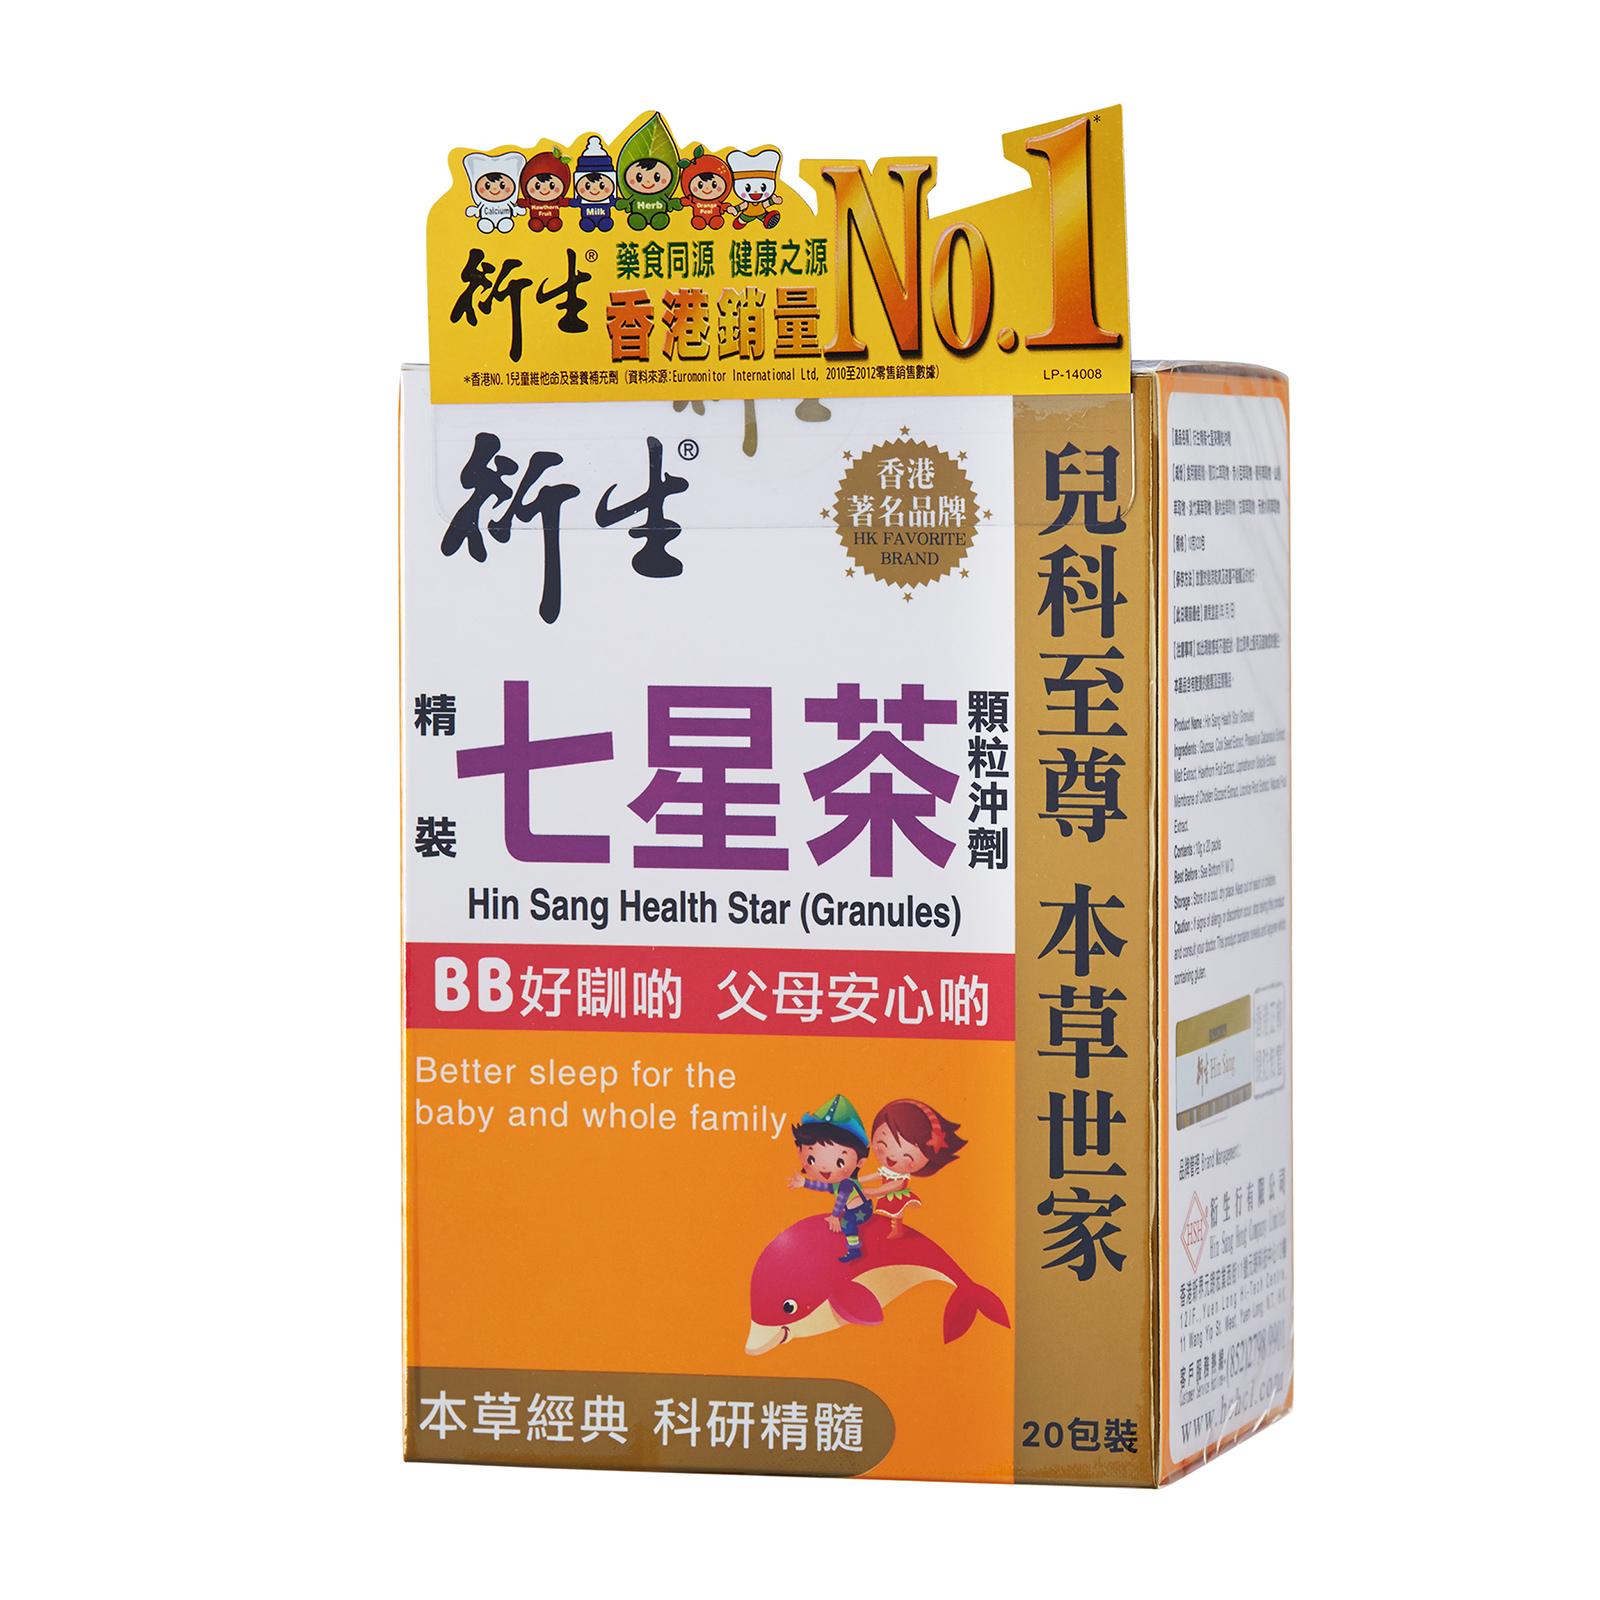 Hin Sang  Health Star (Granules) 1box, 20packs